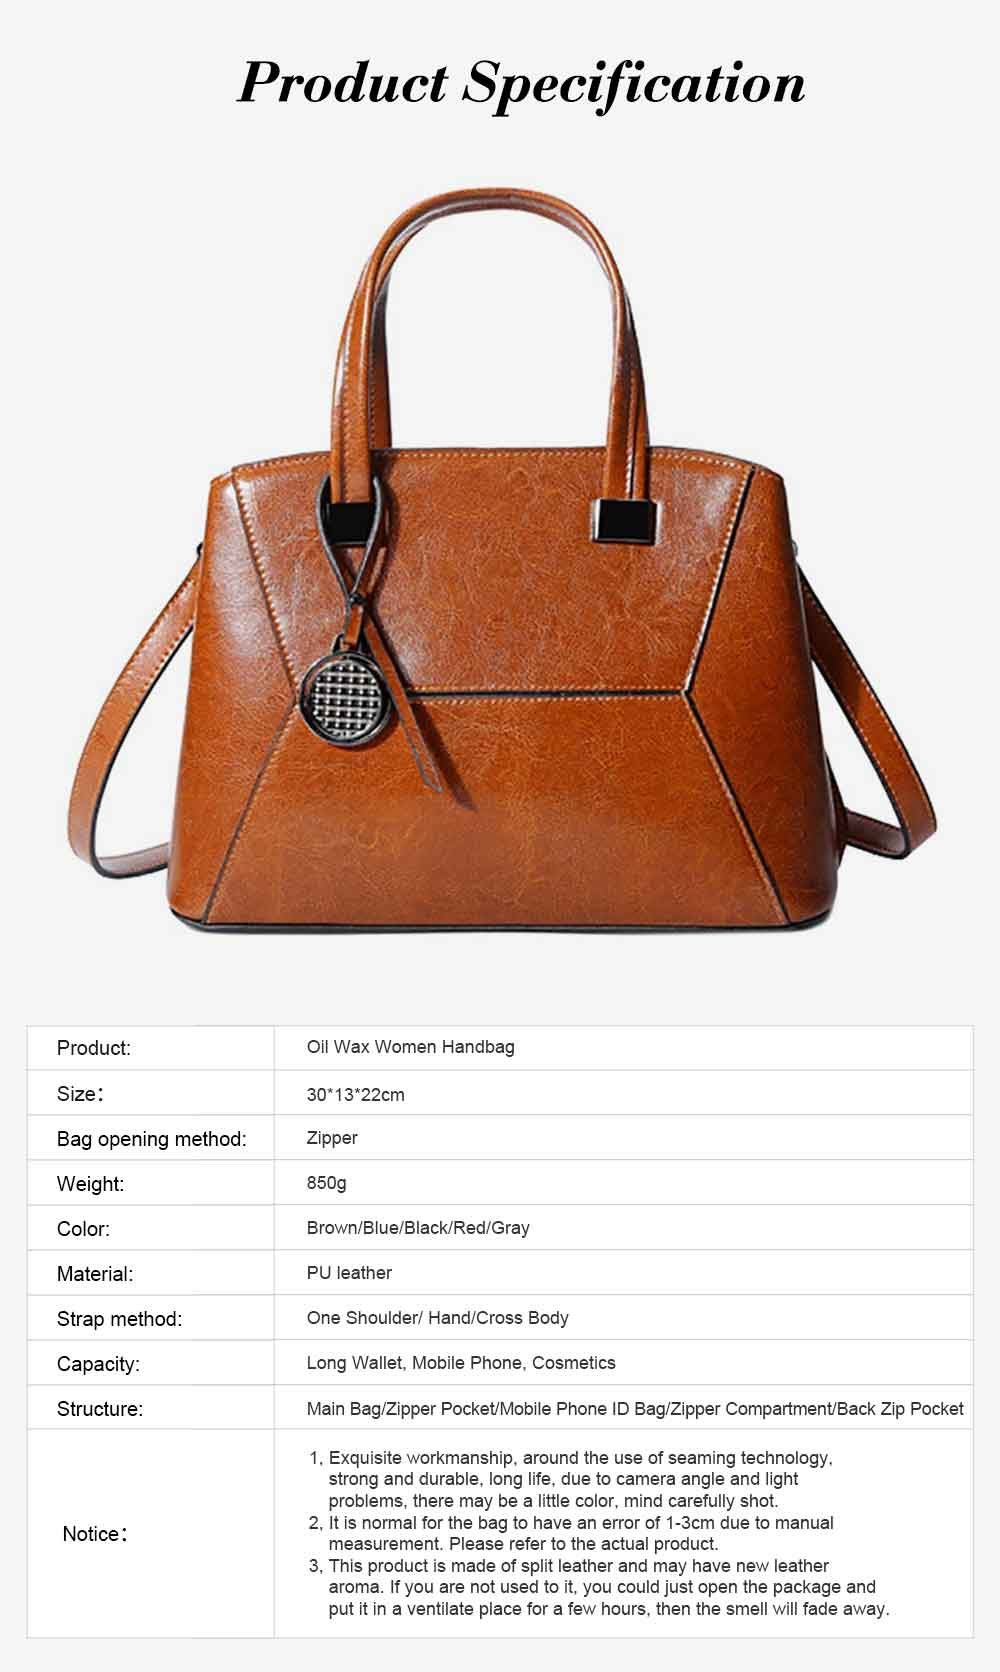 Oil Wax PU Leather Handbags With Detachable Shoulder Strap, Fashion Ladies Portable Slung Shoulder Bag 6